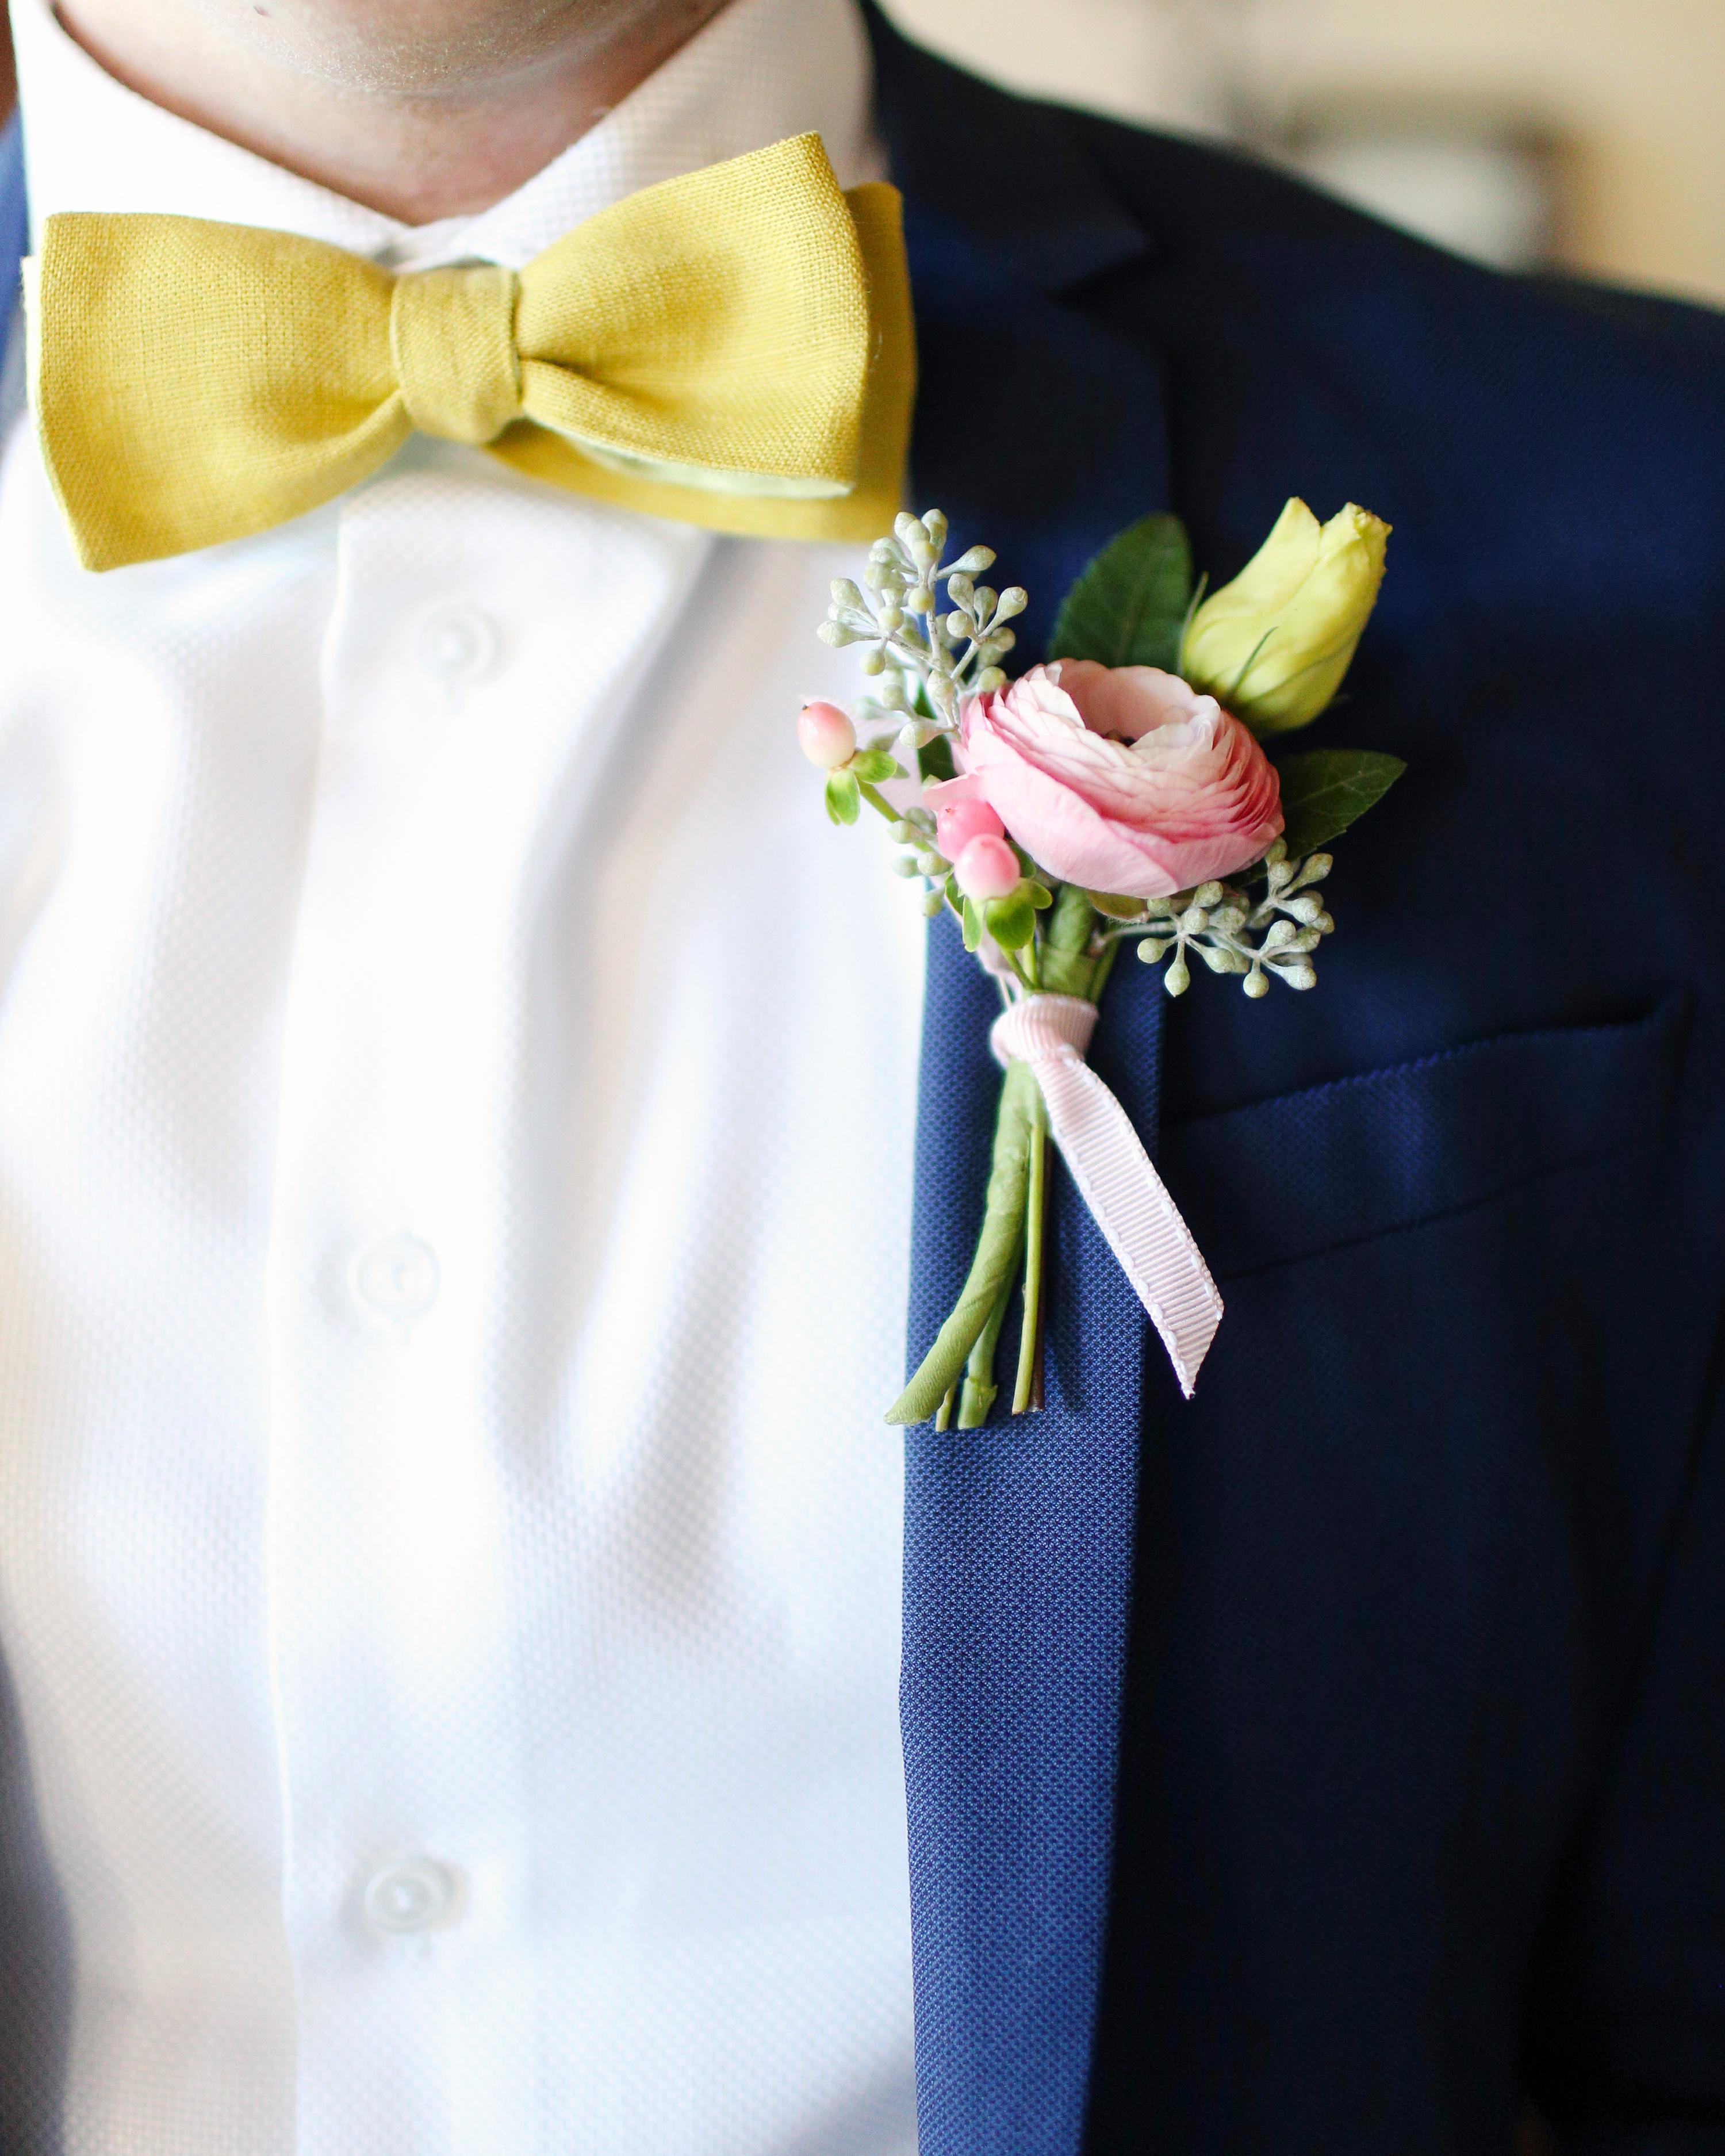 7b0ee6aff8670 64 Boutonnières You Both Will Love | Martha Stewart Weddings